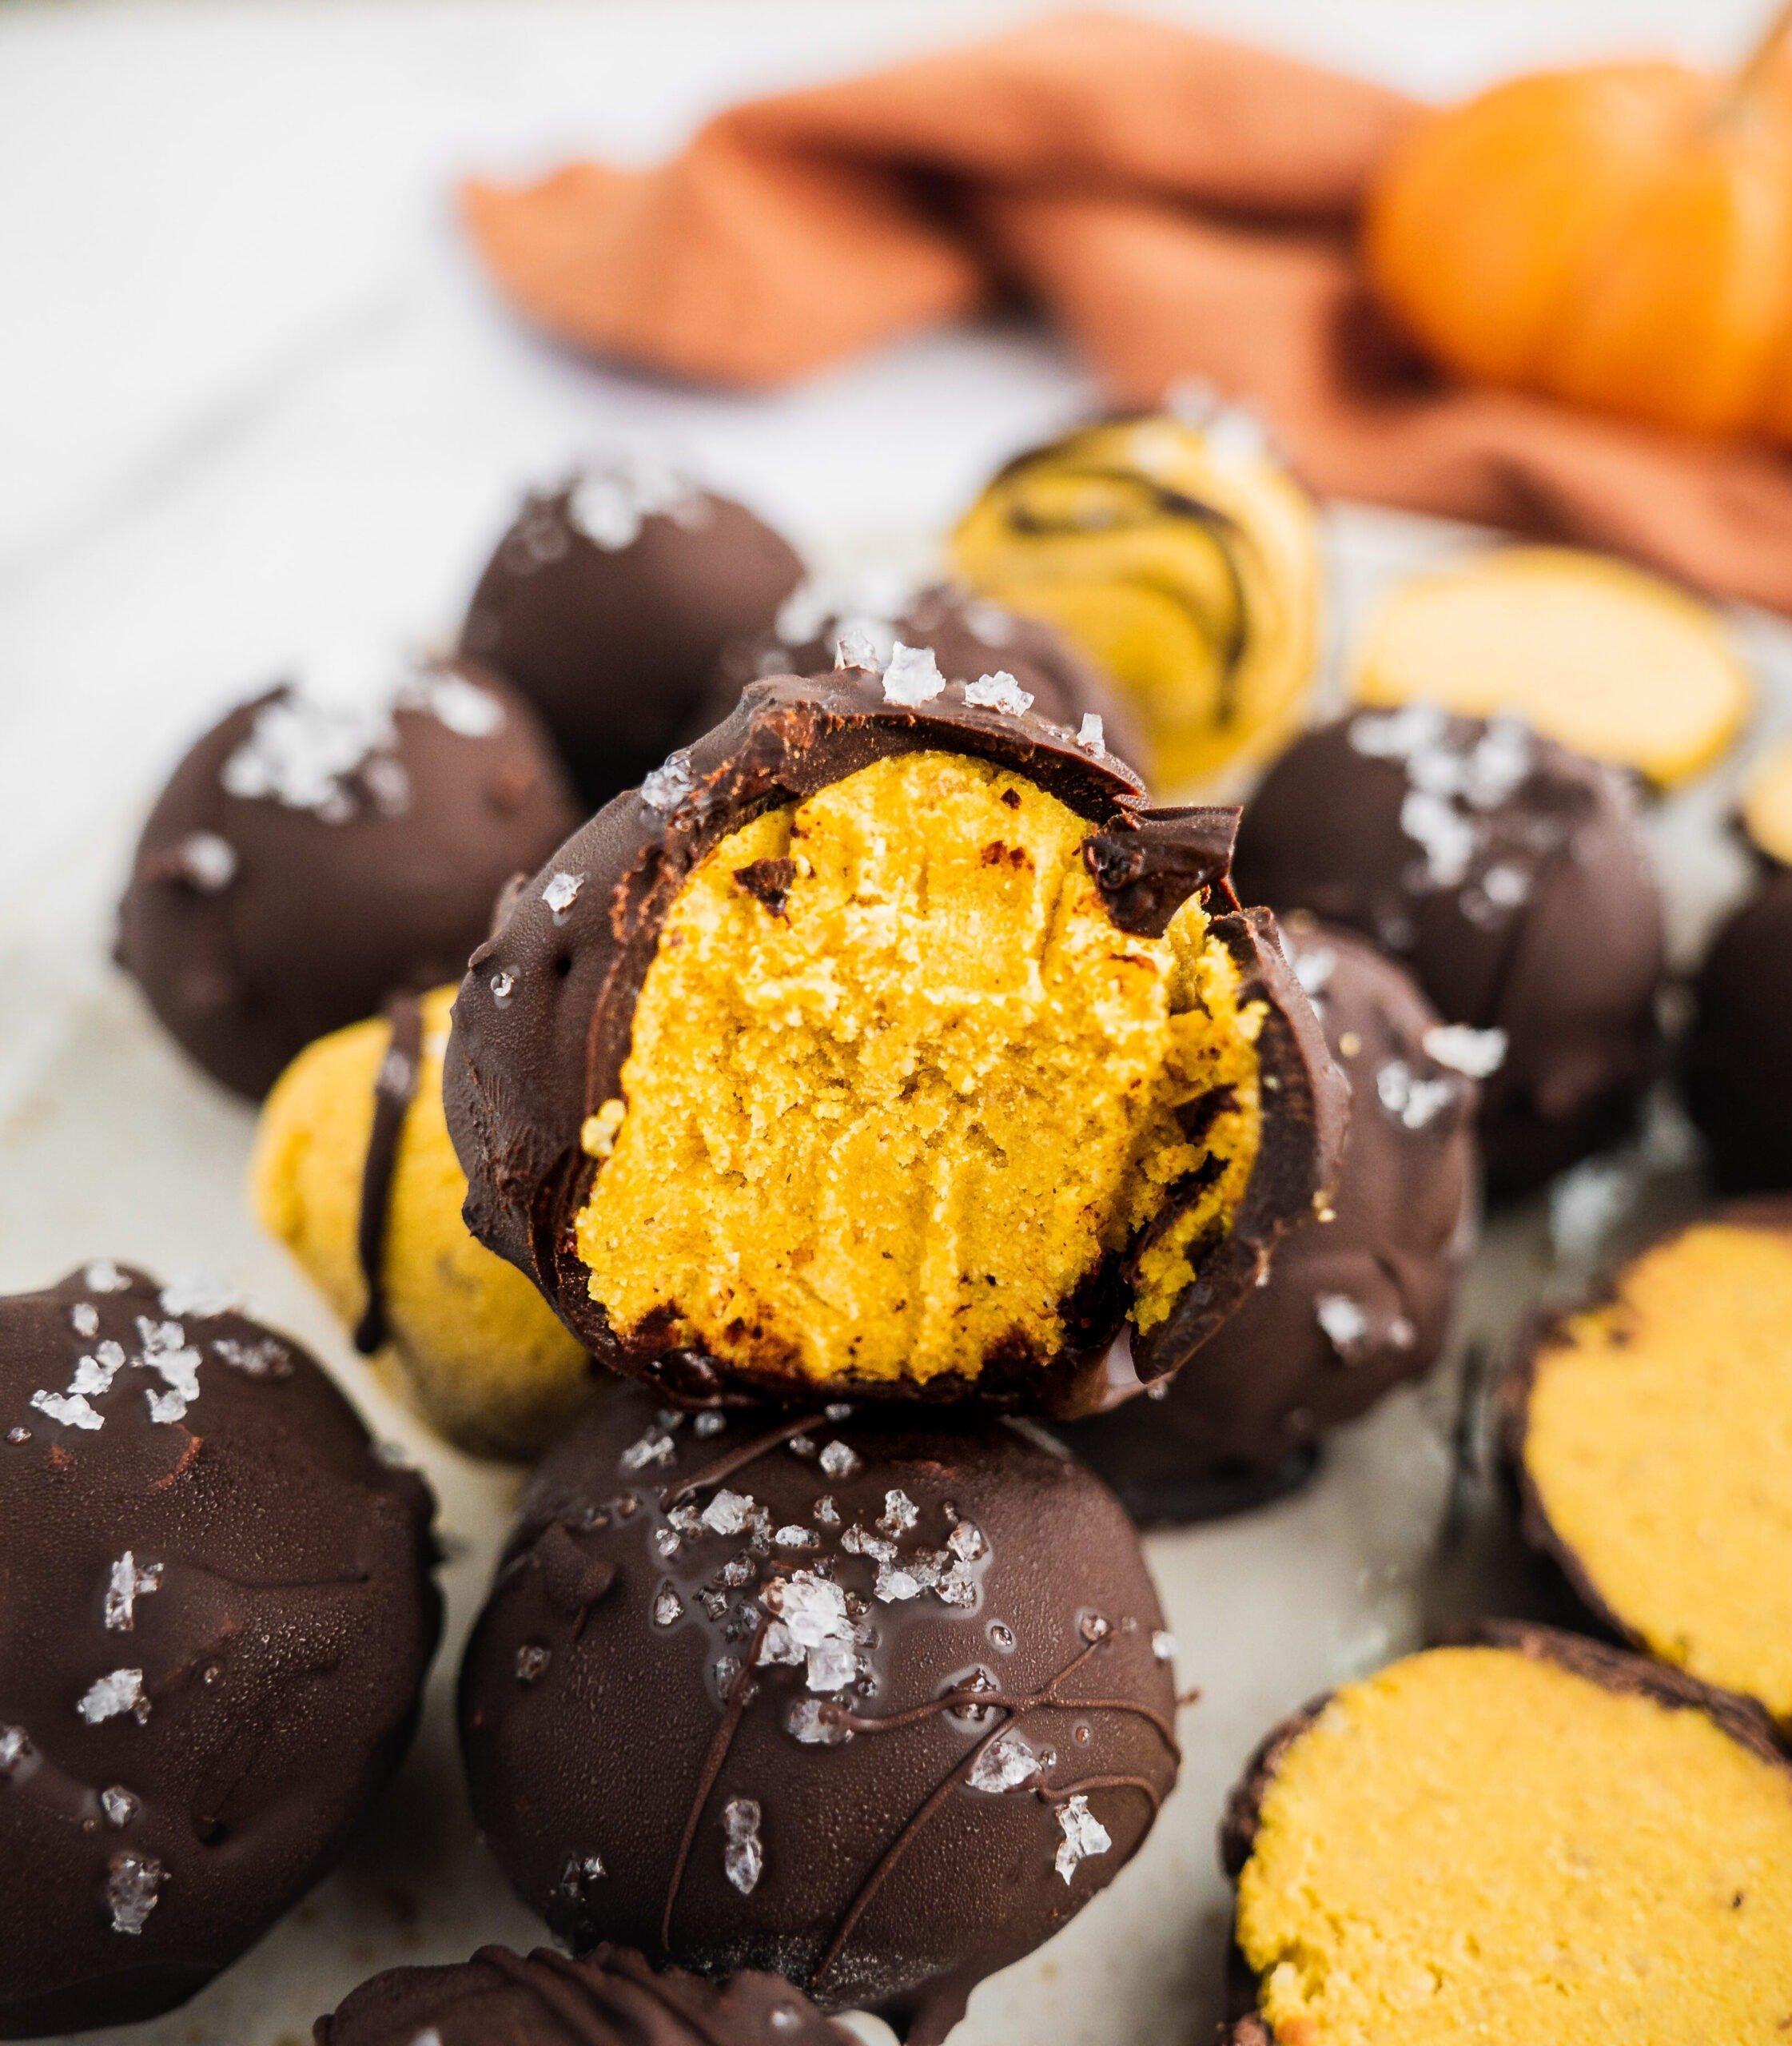 Pumpkin Spice Chocolate Truffle (Paleo, Vegan)